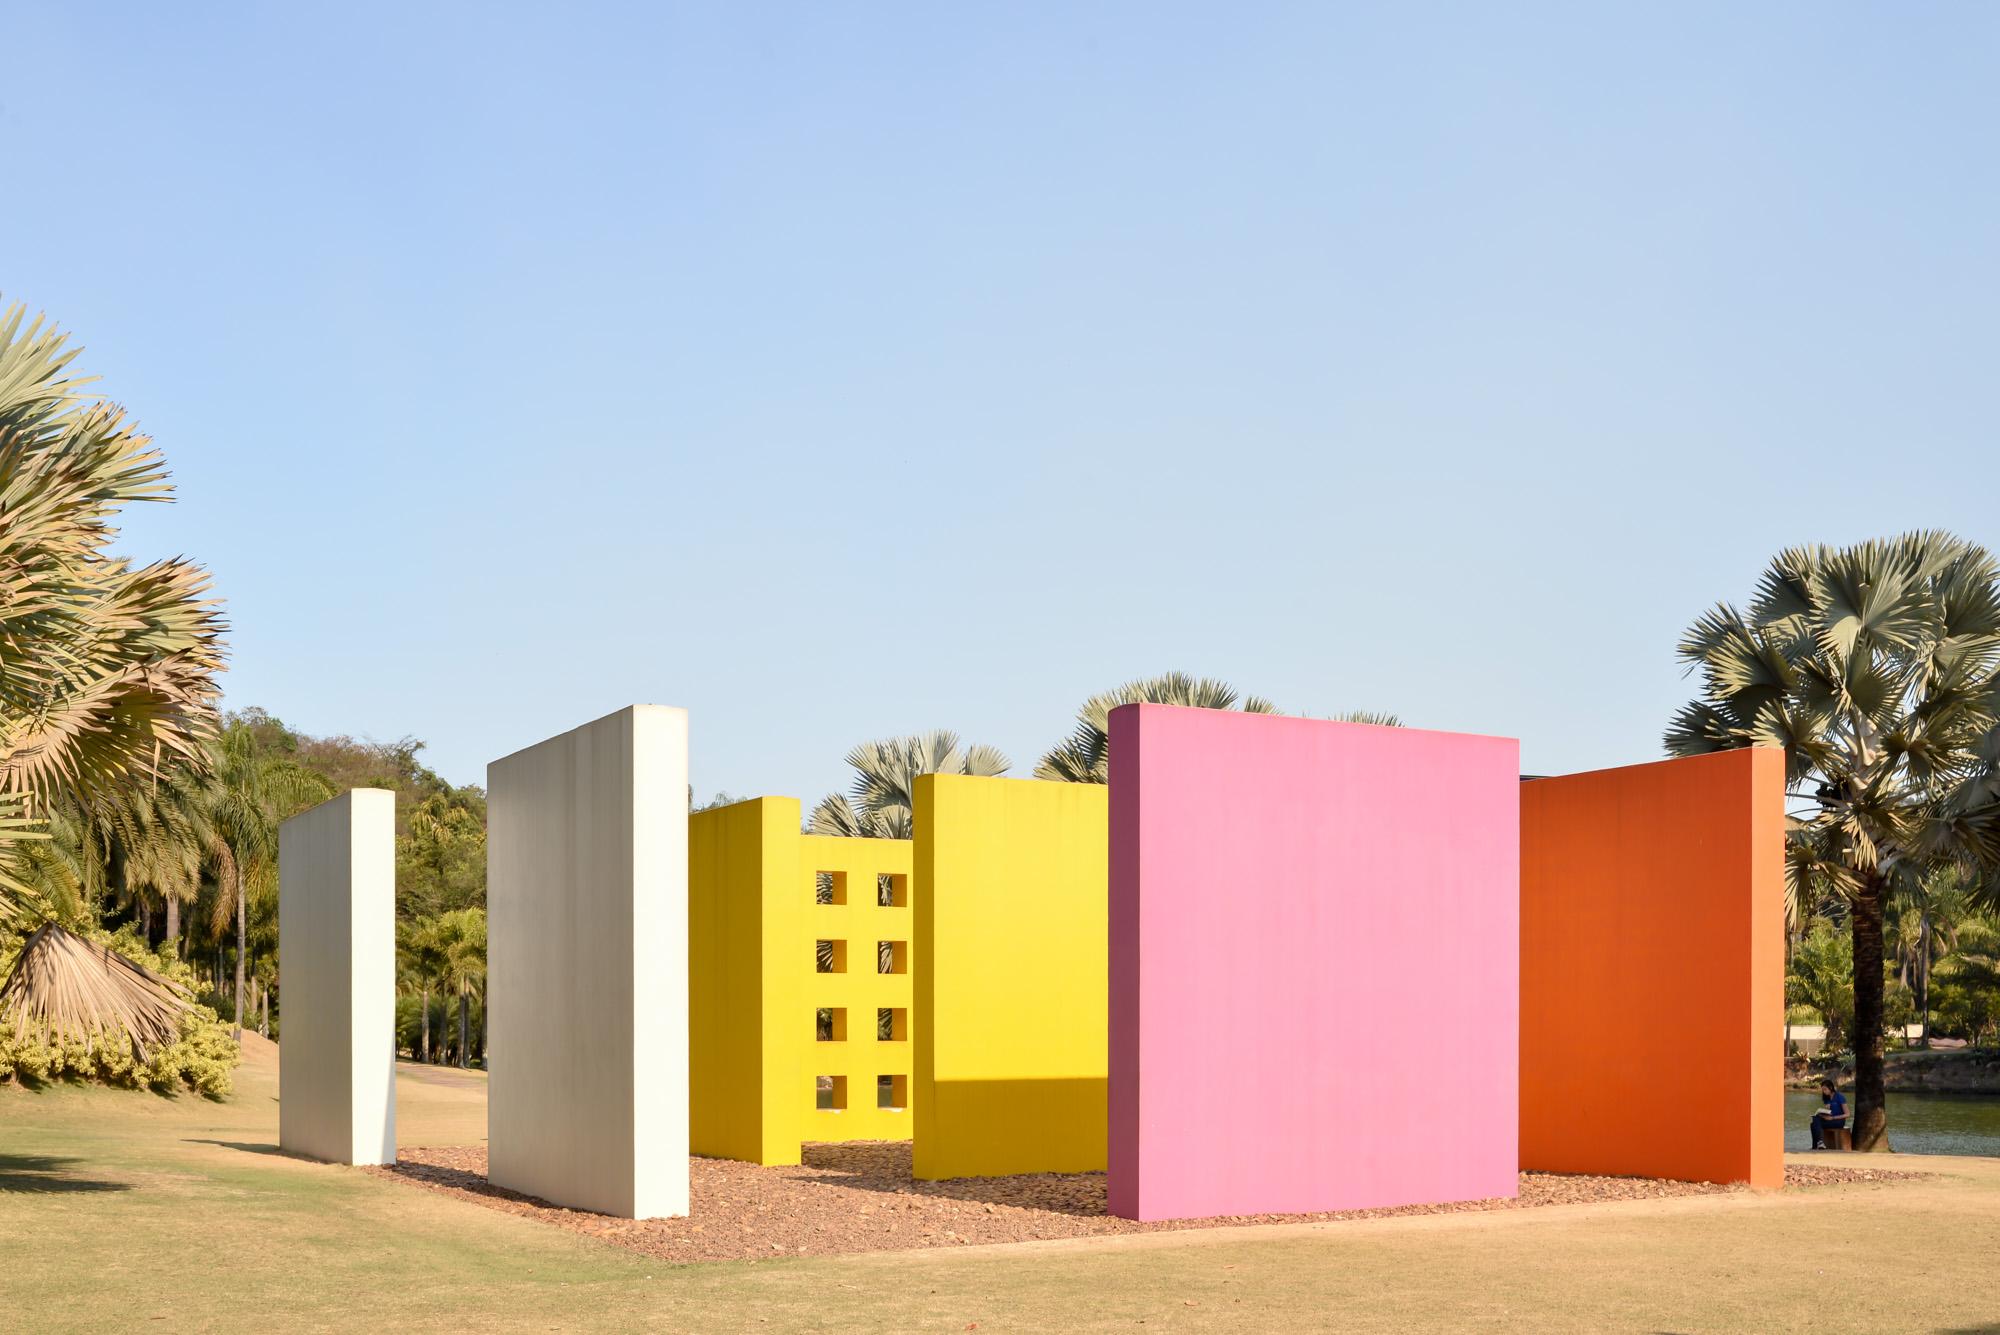 Inhotim, um jardim botânico-artístico_Num Postal